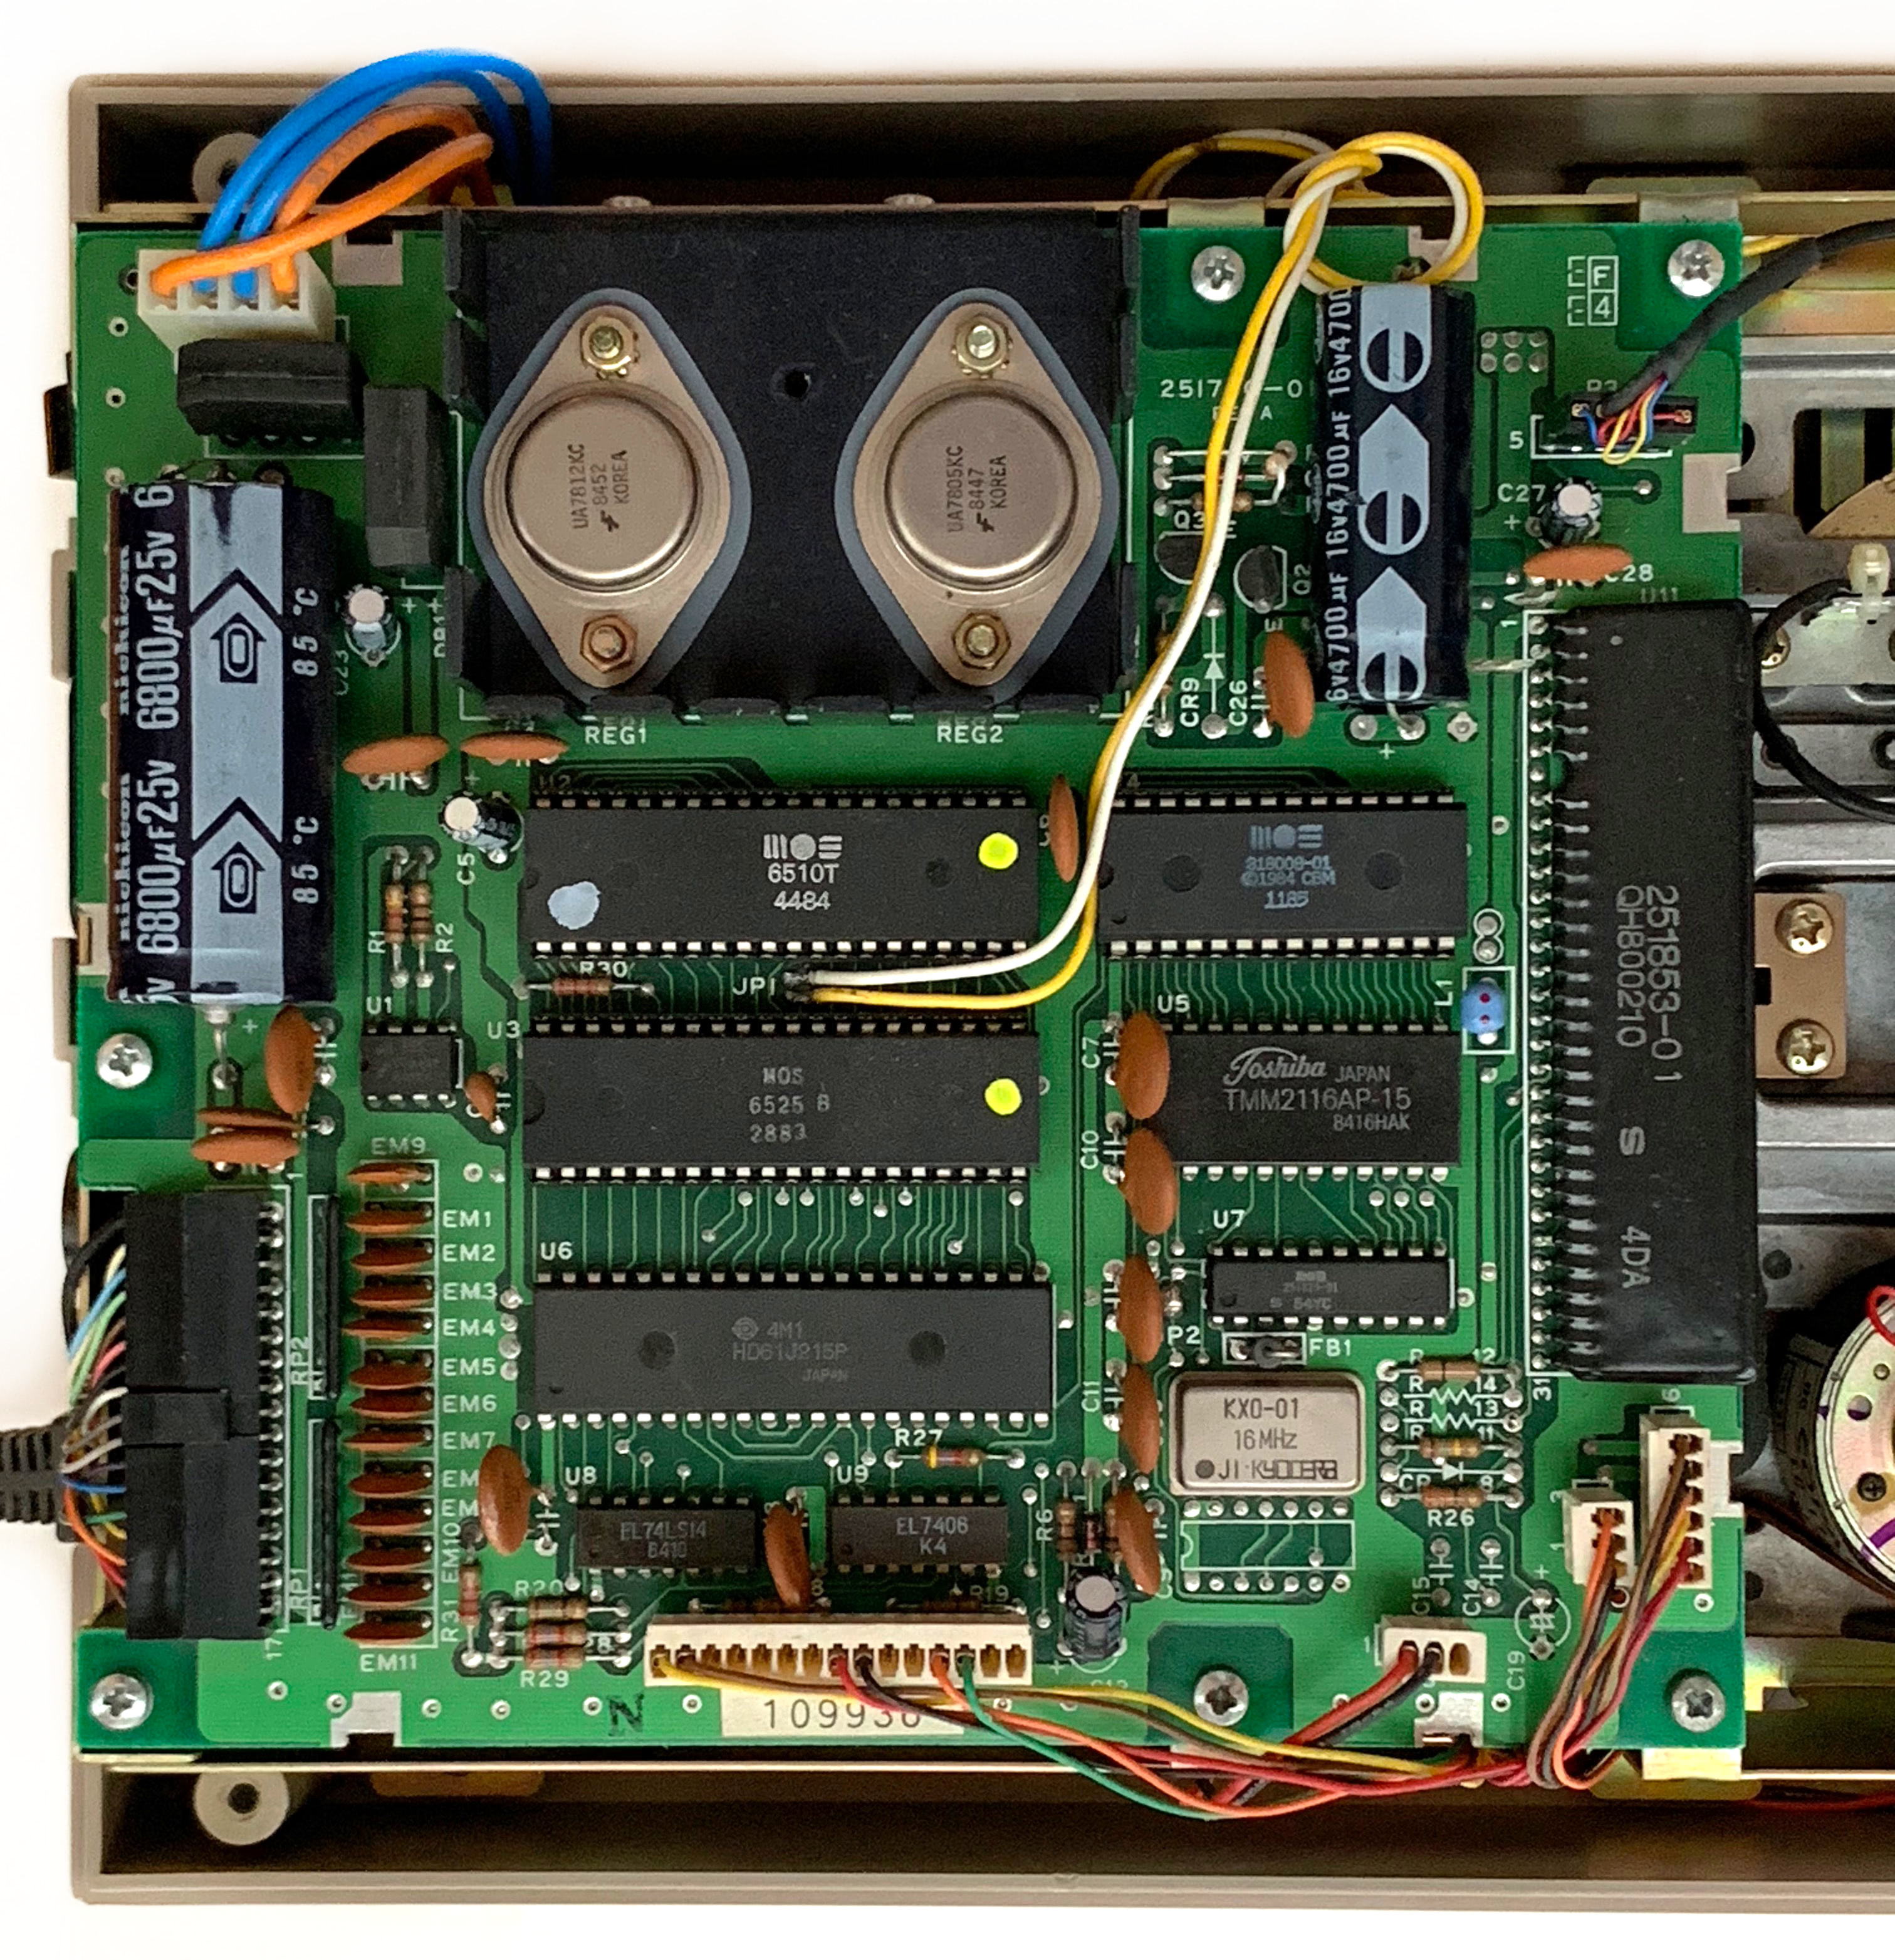 Converting a Commodore 1541 or 1570 Drive into a 1551